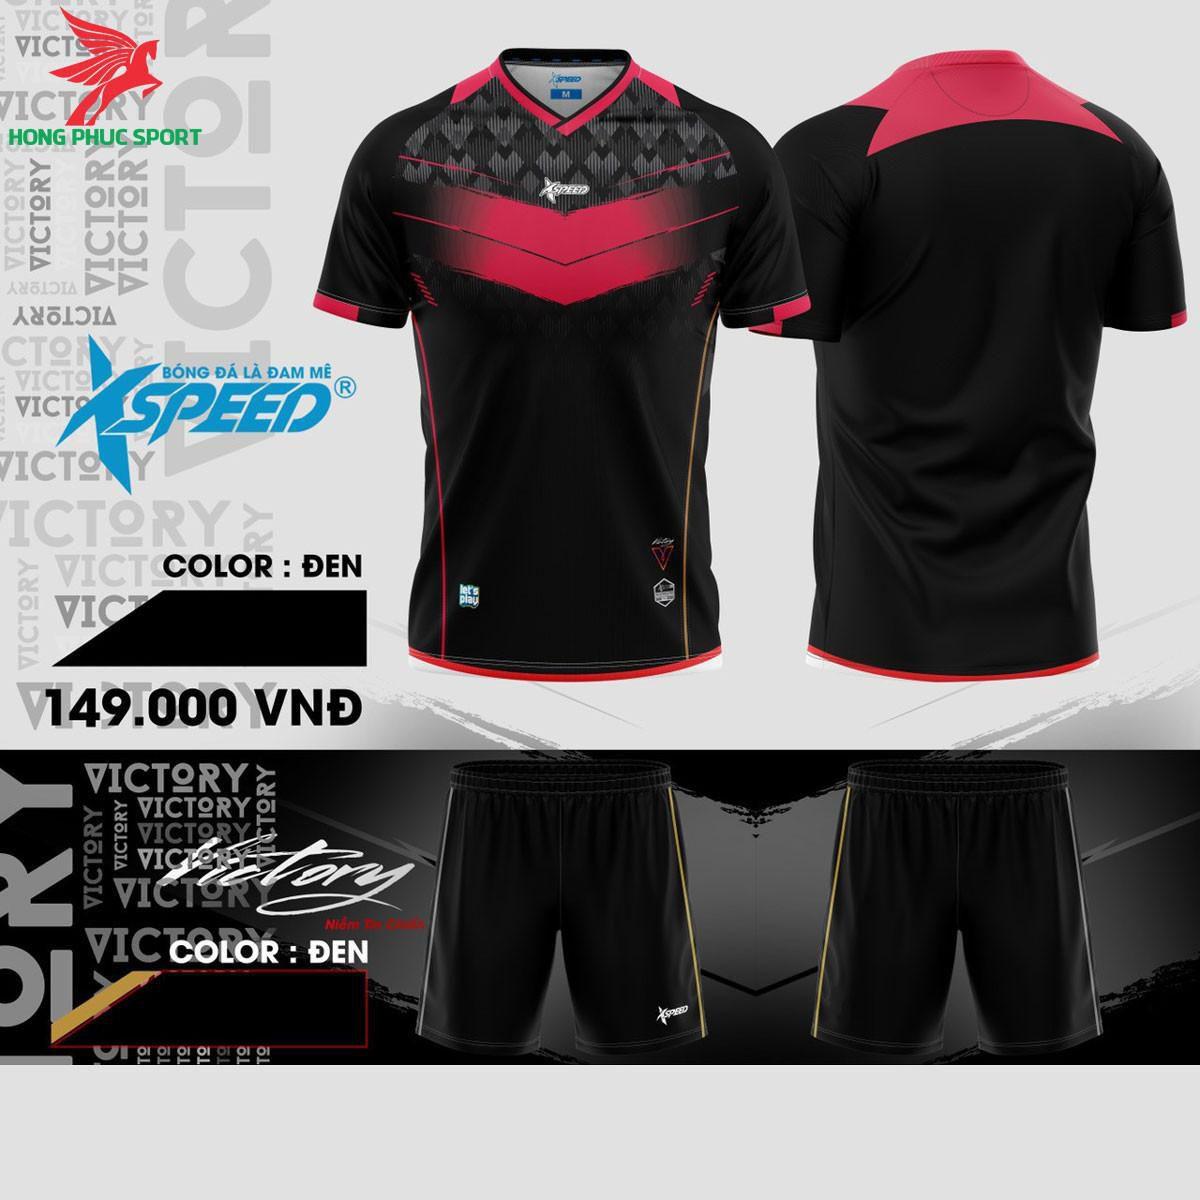 https://cdn.hongphucsport.com/unsafe/s4.shopbay.vn/files/285/ao-khong-logo-xspeed-victory-mau-den-605168aa9f202.jpg